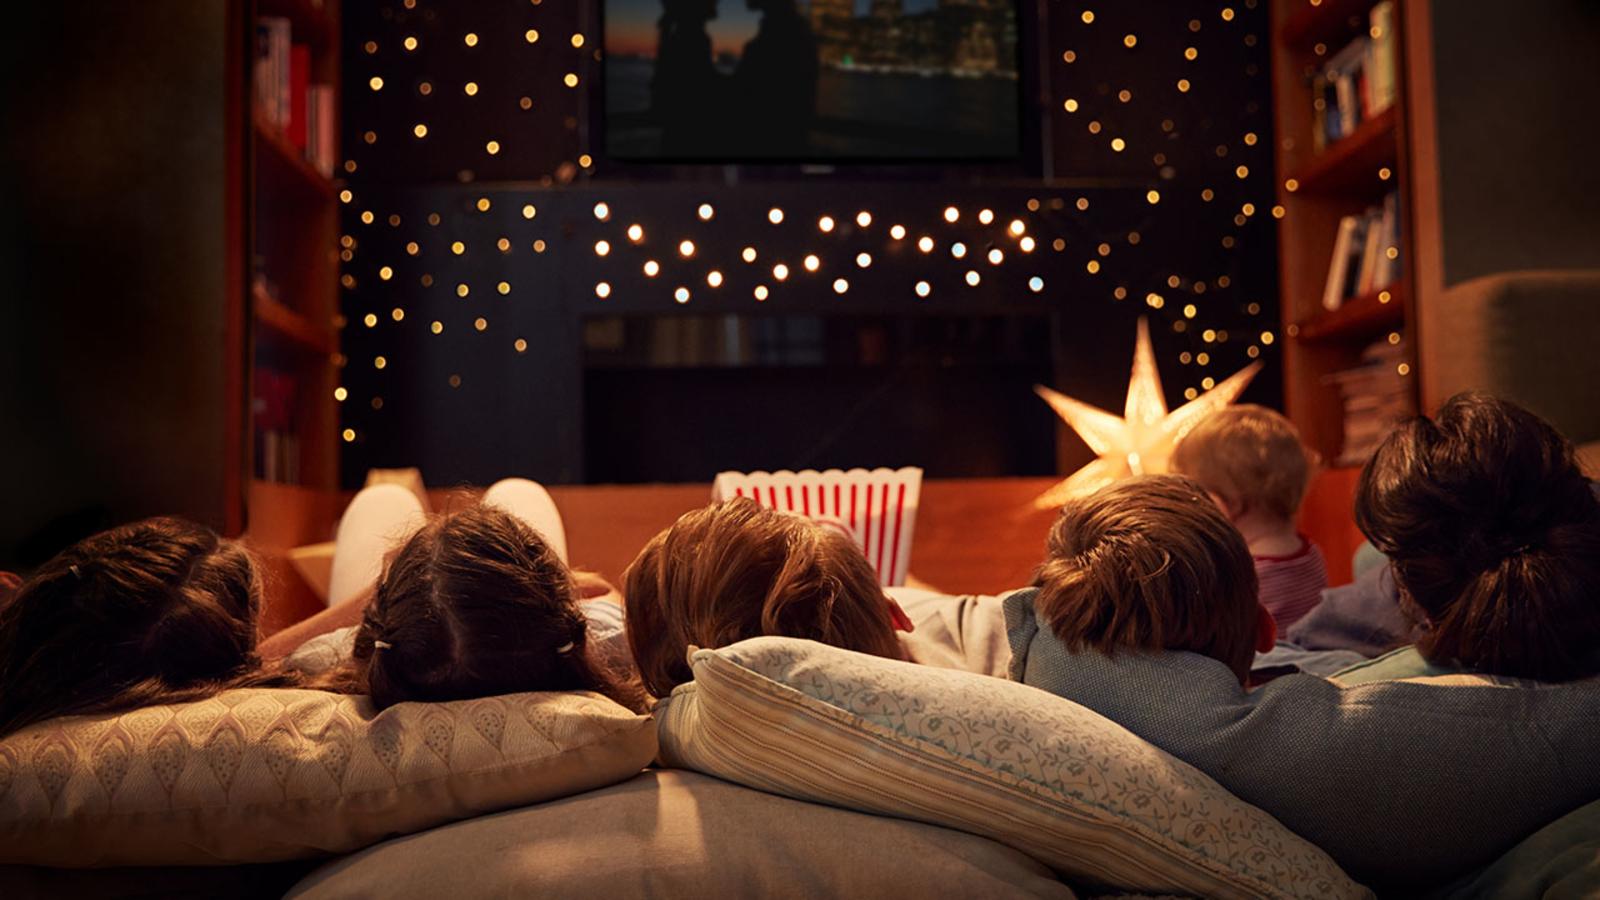 CenturyLink wants to pay you $1,000 to watch Hallmark Christmas movies - ABC13 Houston